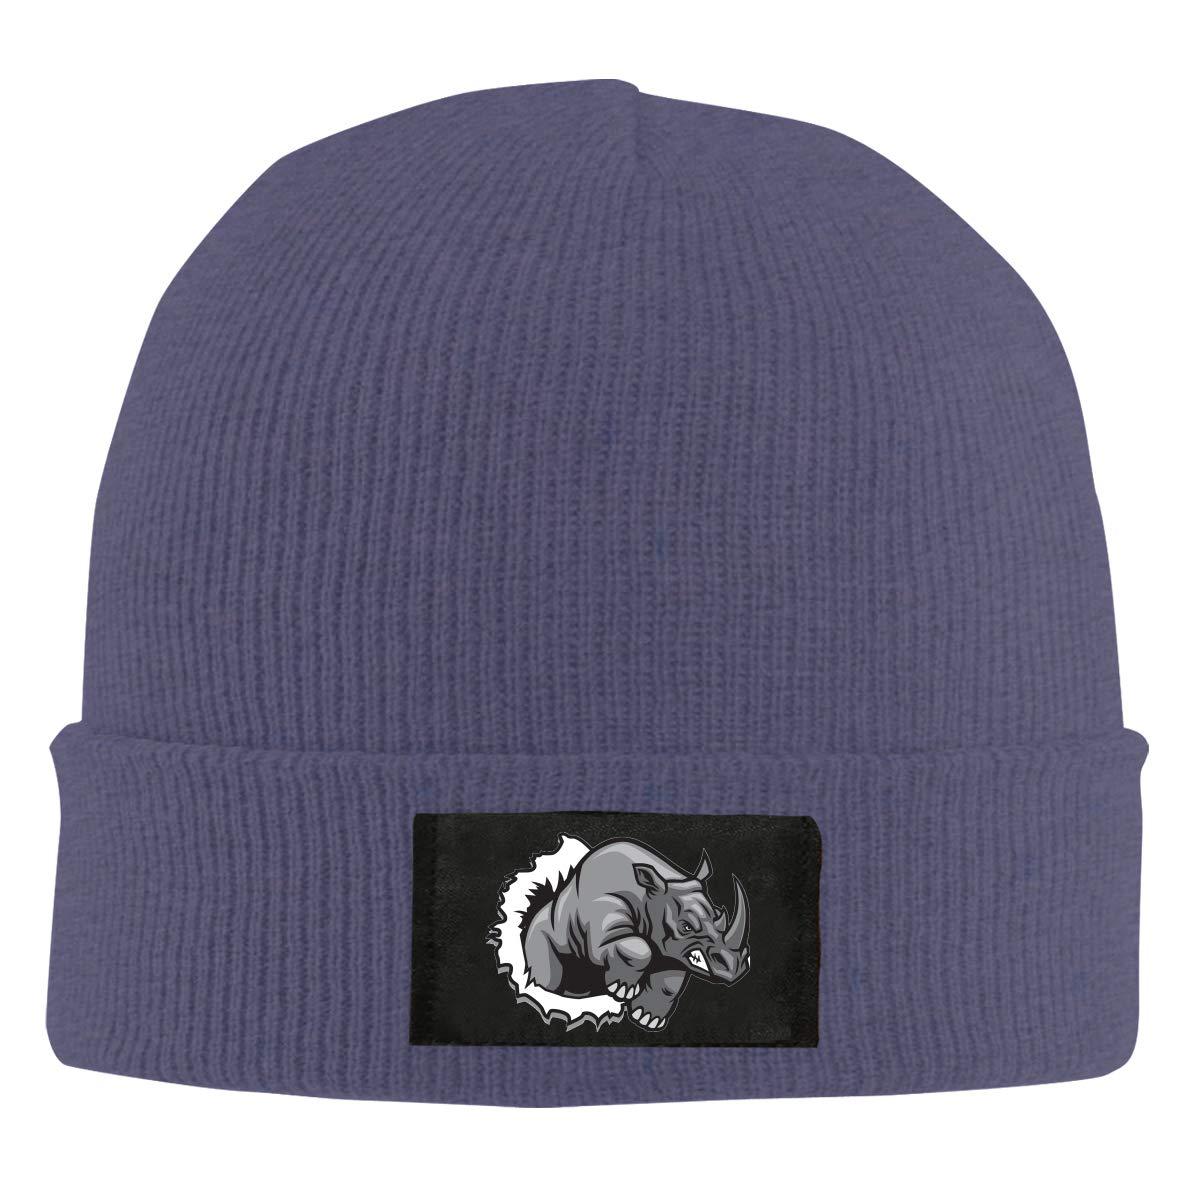 ASDGEGASFAS Unisex Rhino Ripping Skull Cap Knit Wool Beanie Hat Stretchy Solid Daily Wear